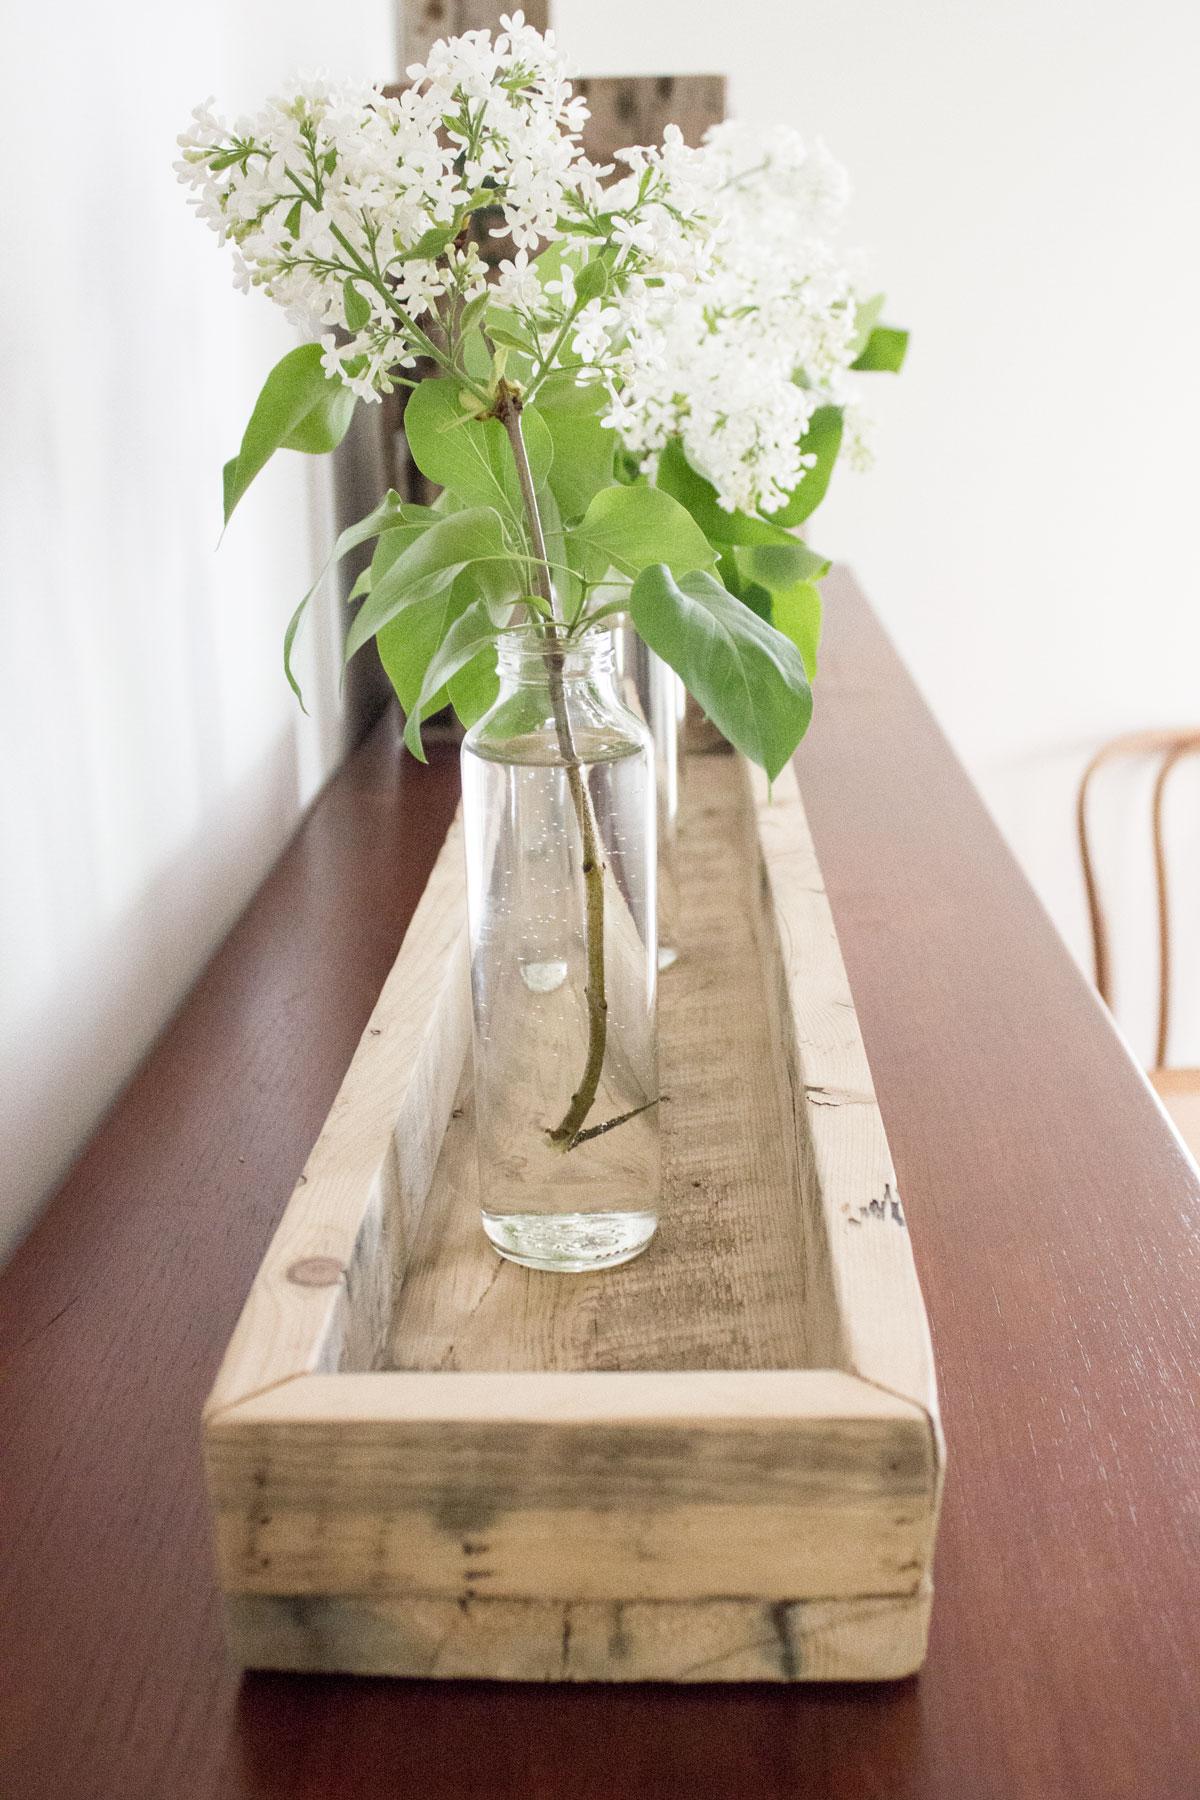 DIY reclaimed barn board tray